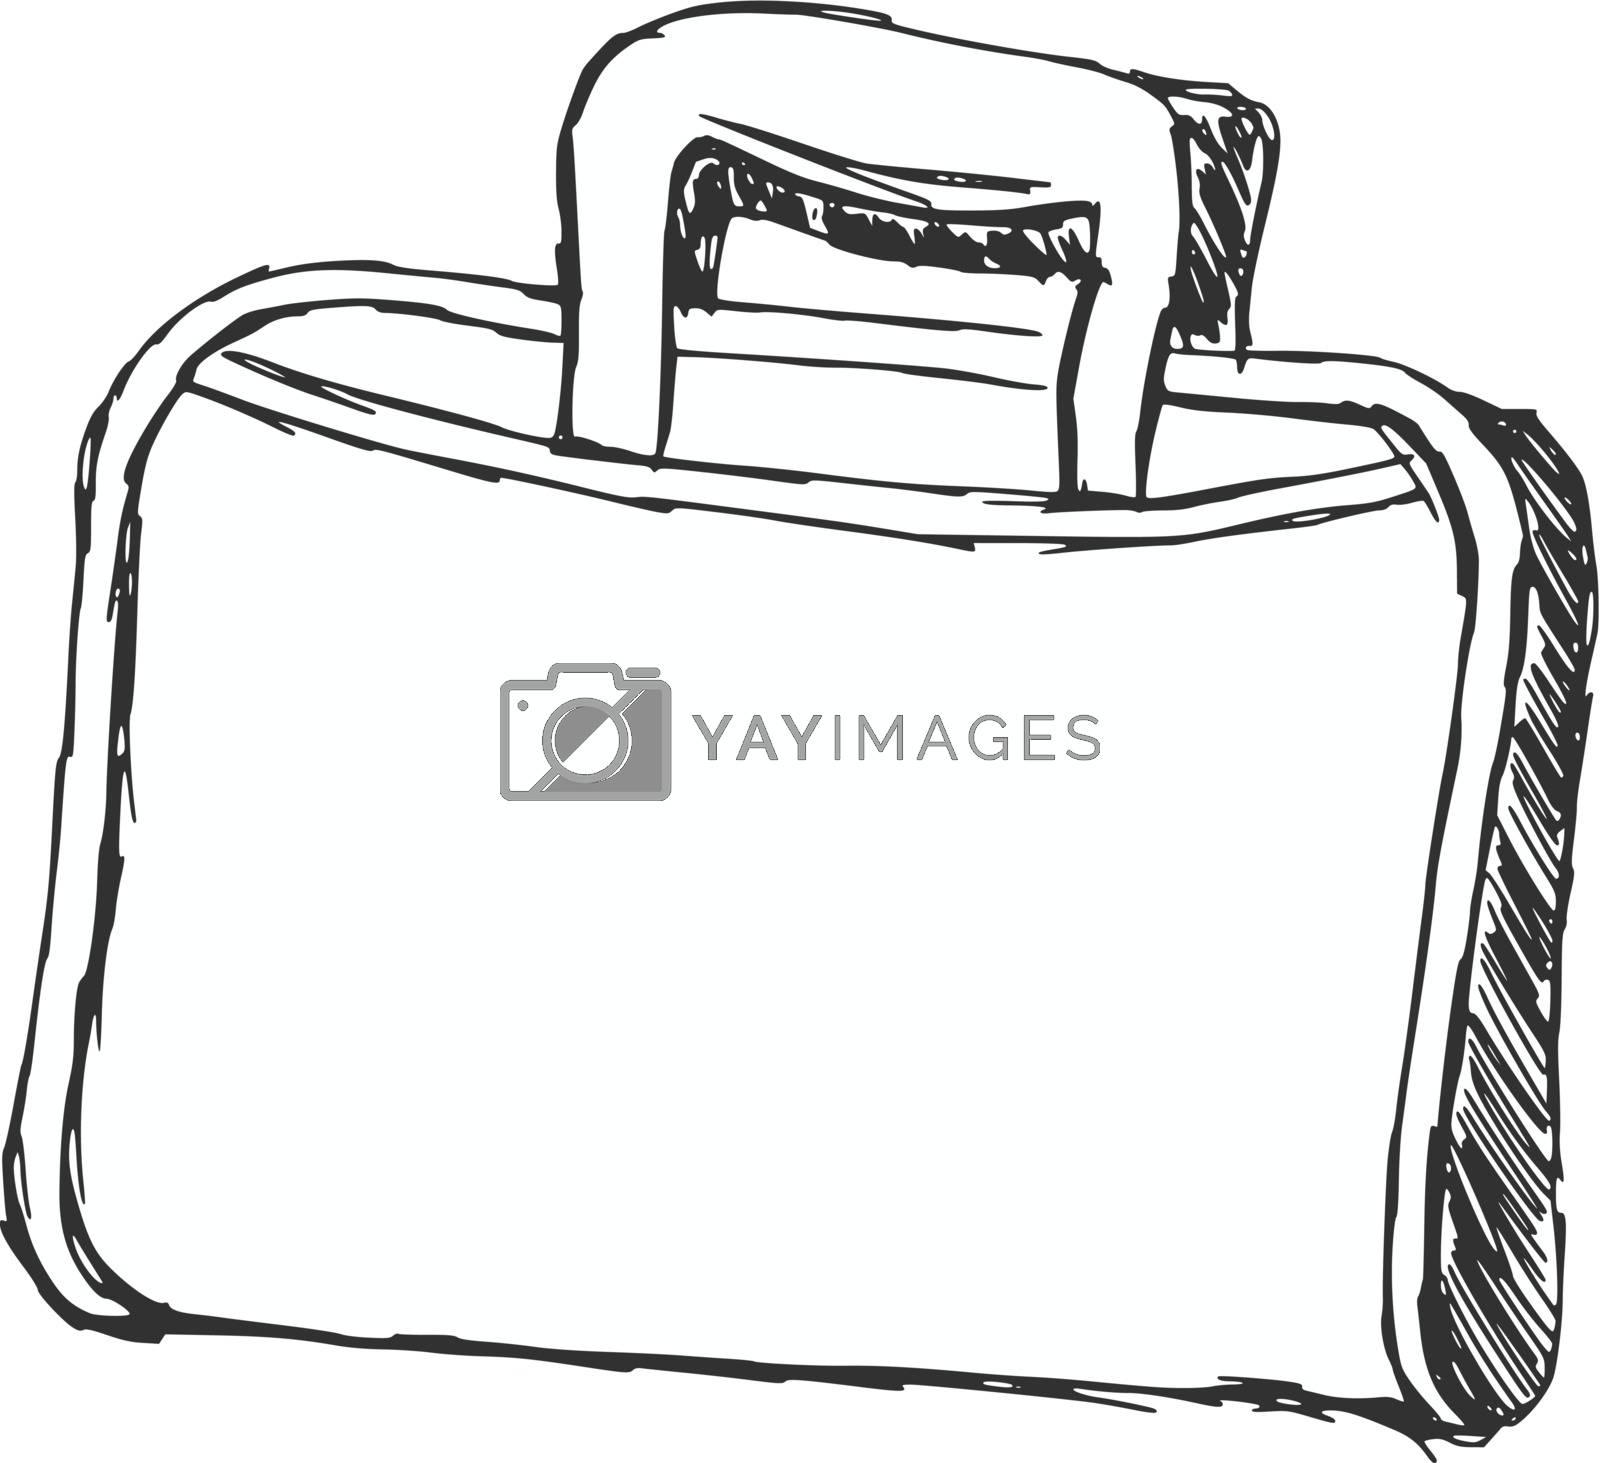 hand drawn, cartoon, sketch illustration of briefcase